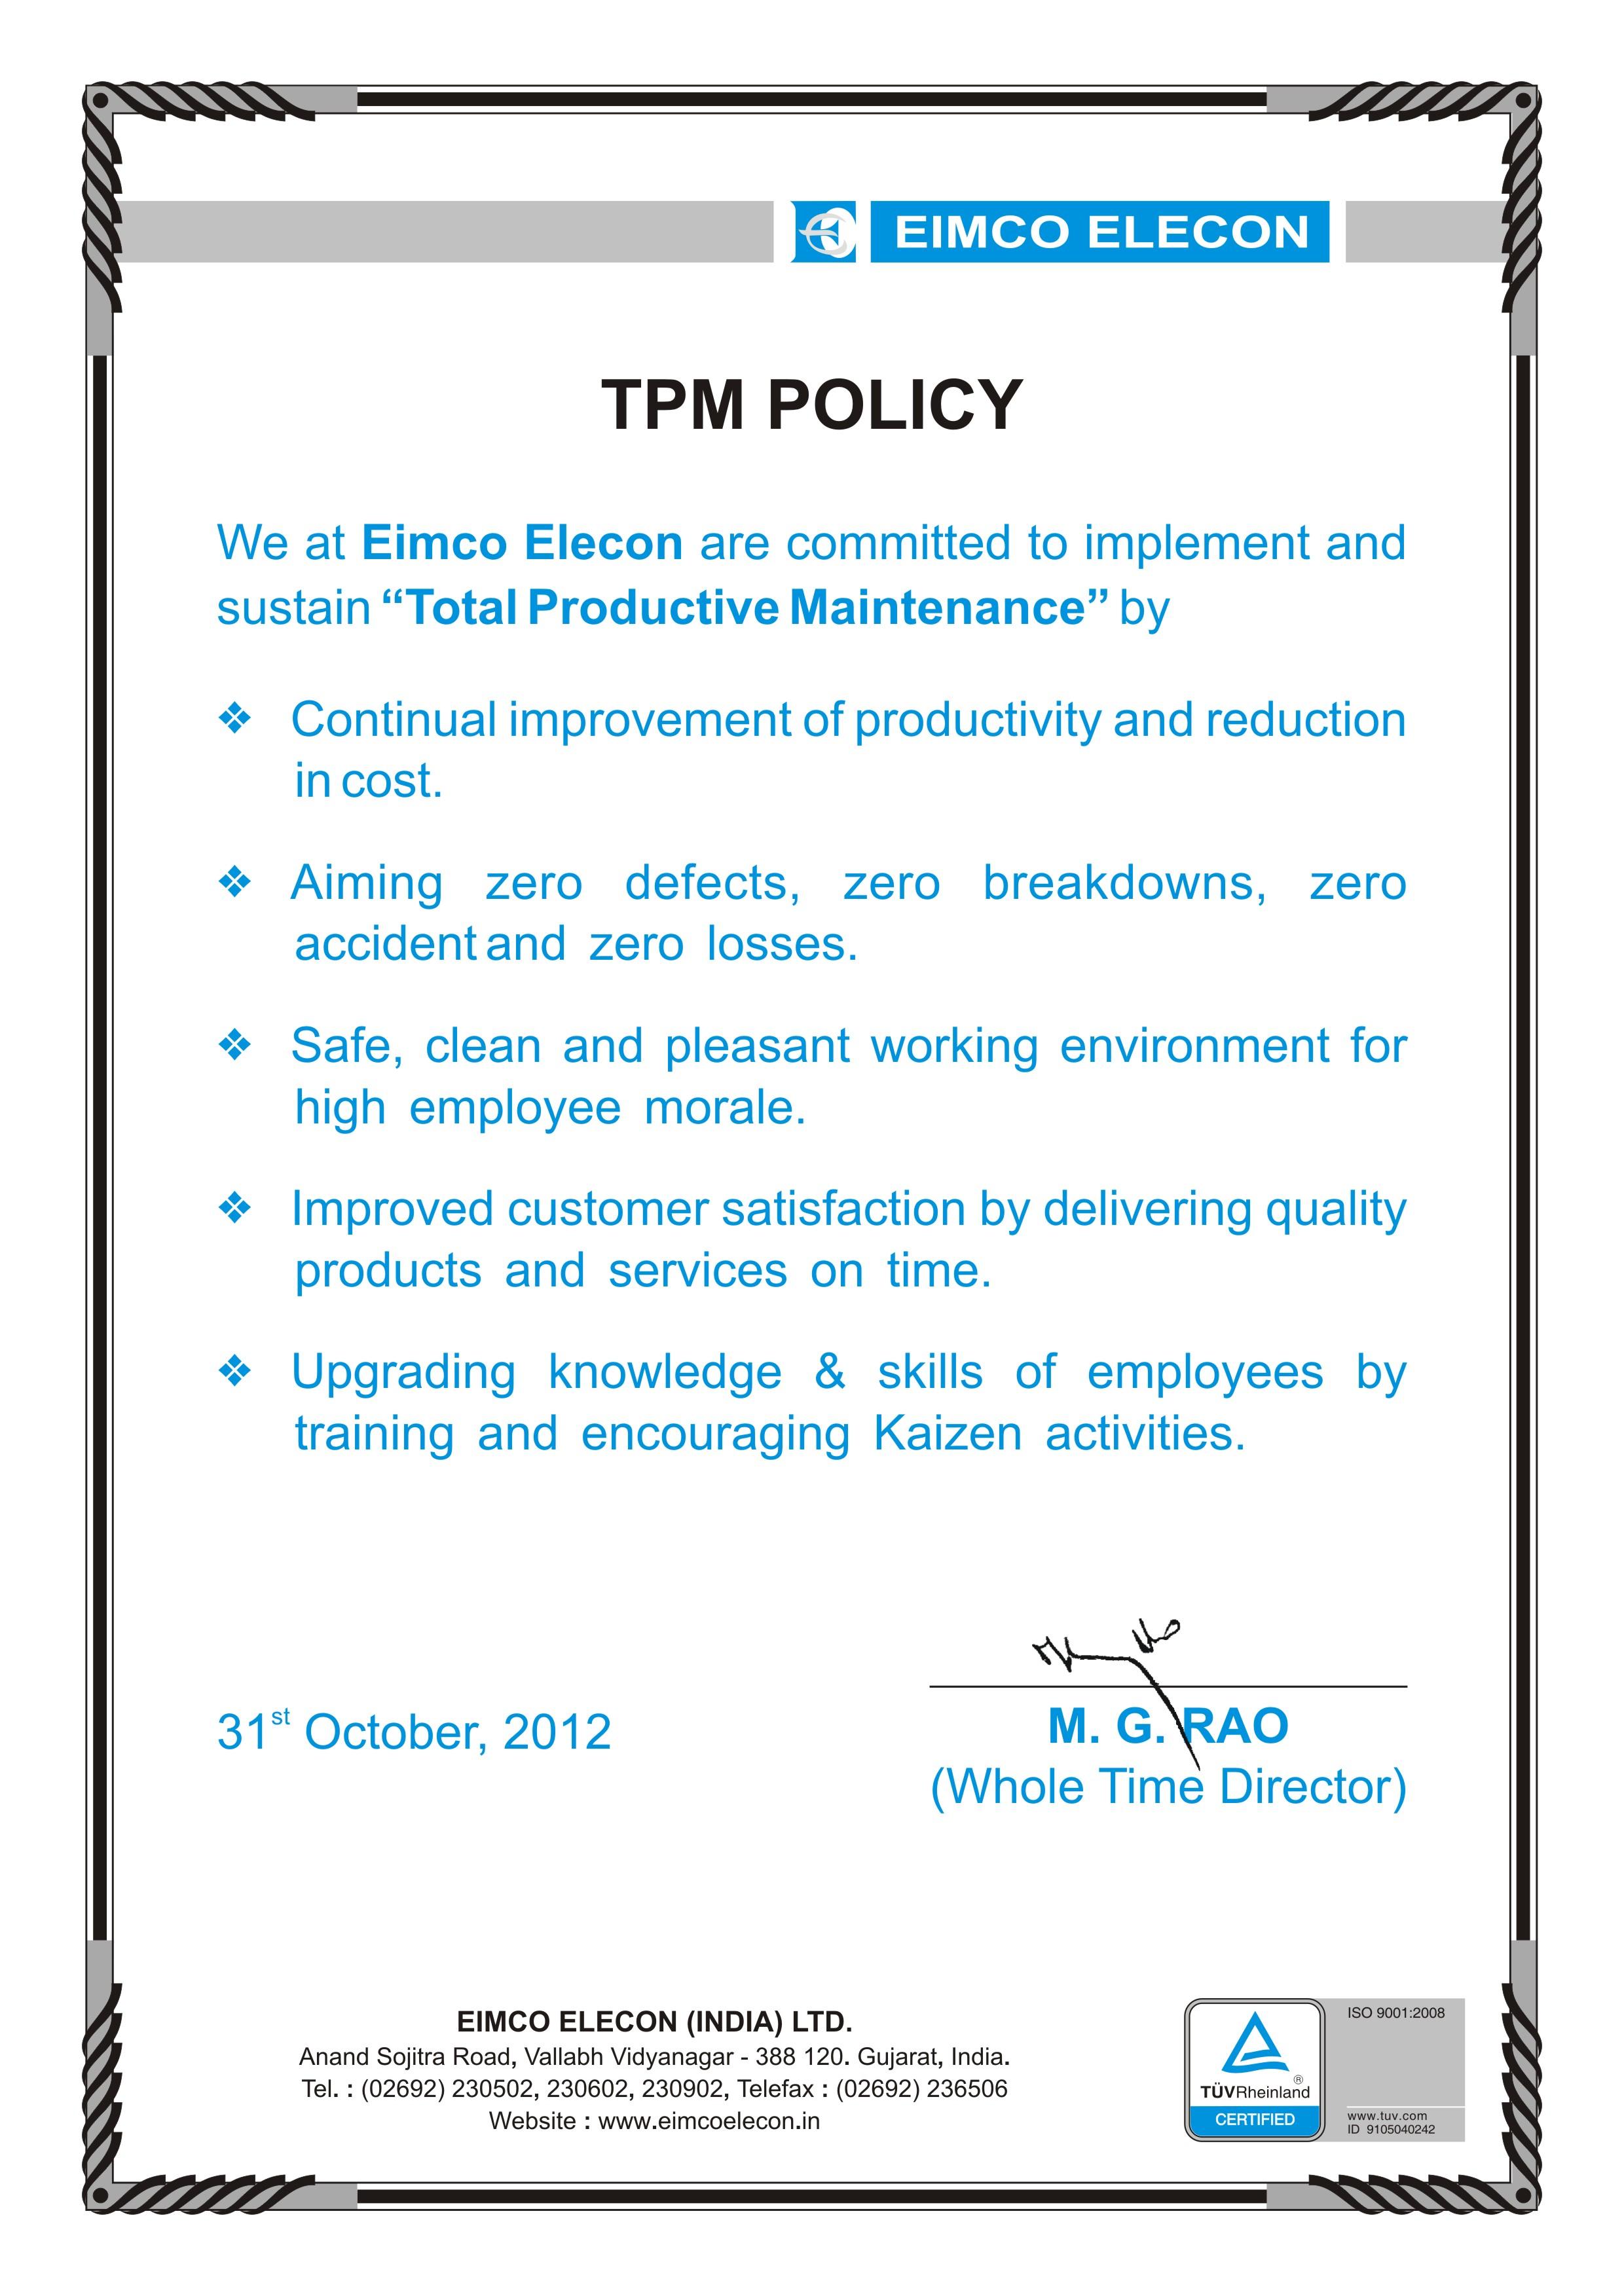 Code Of Conduct Eimco Elecon India Limitedeimco Elecon